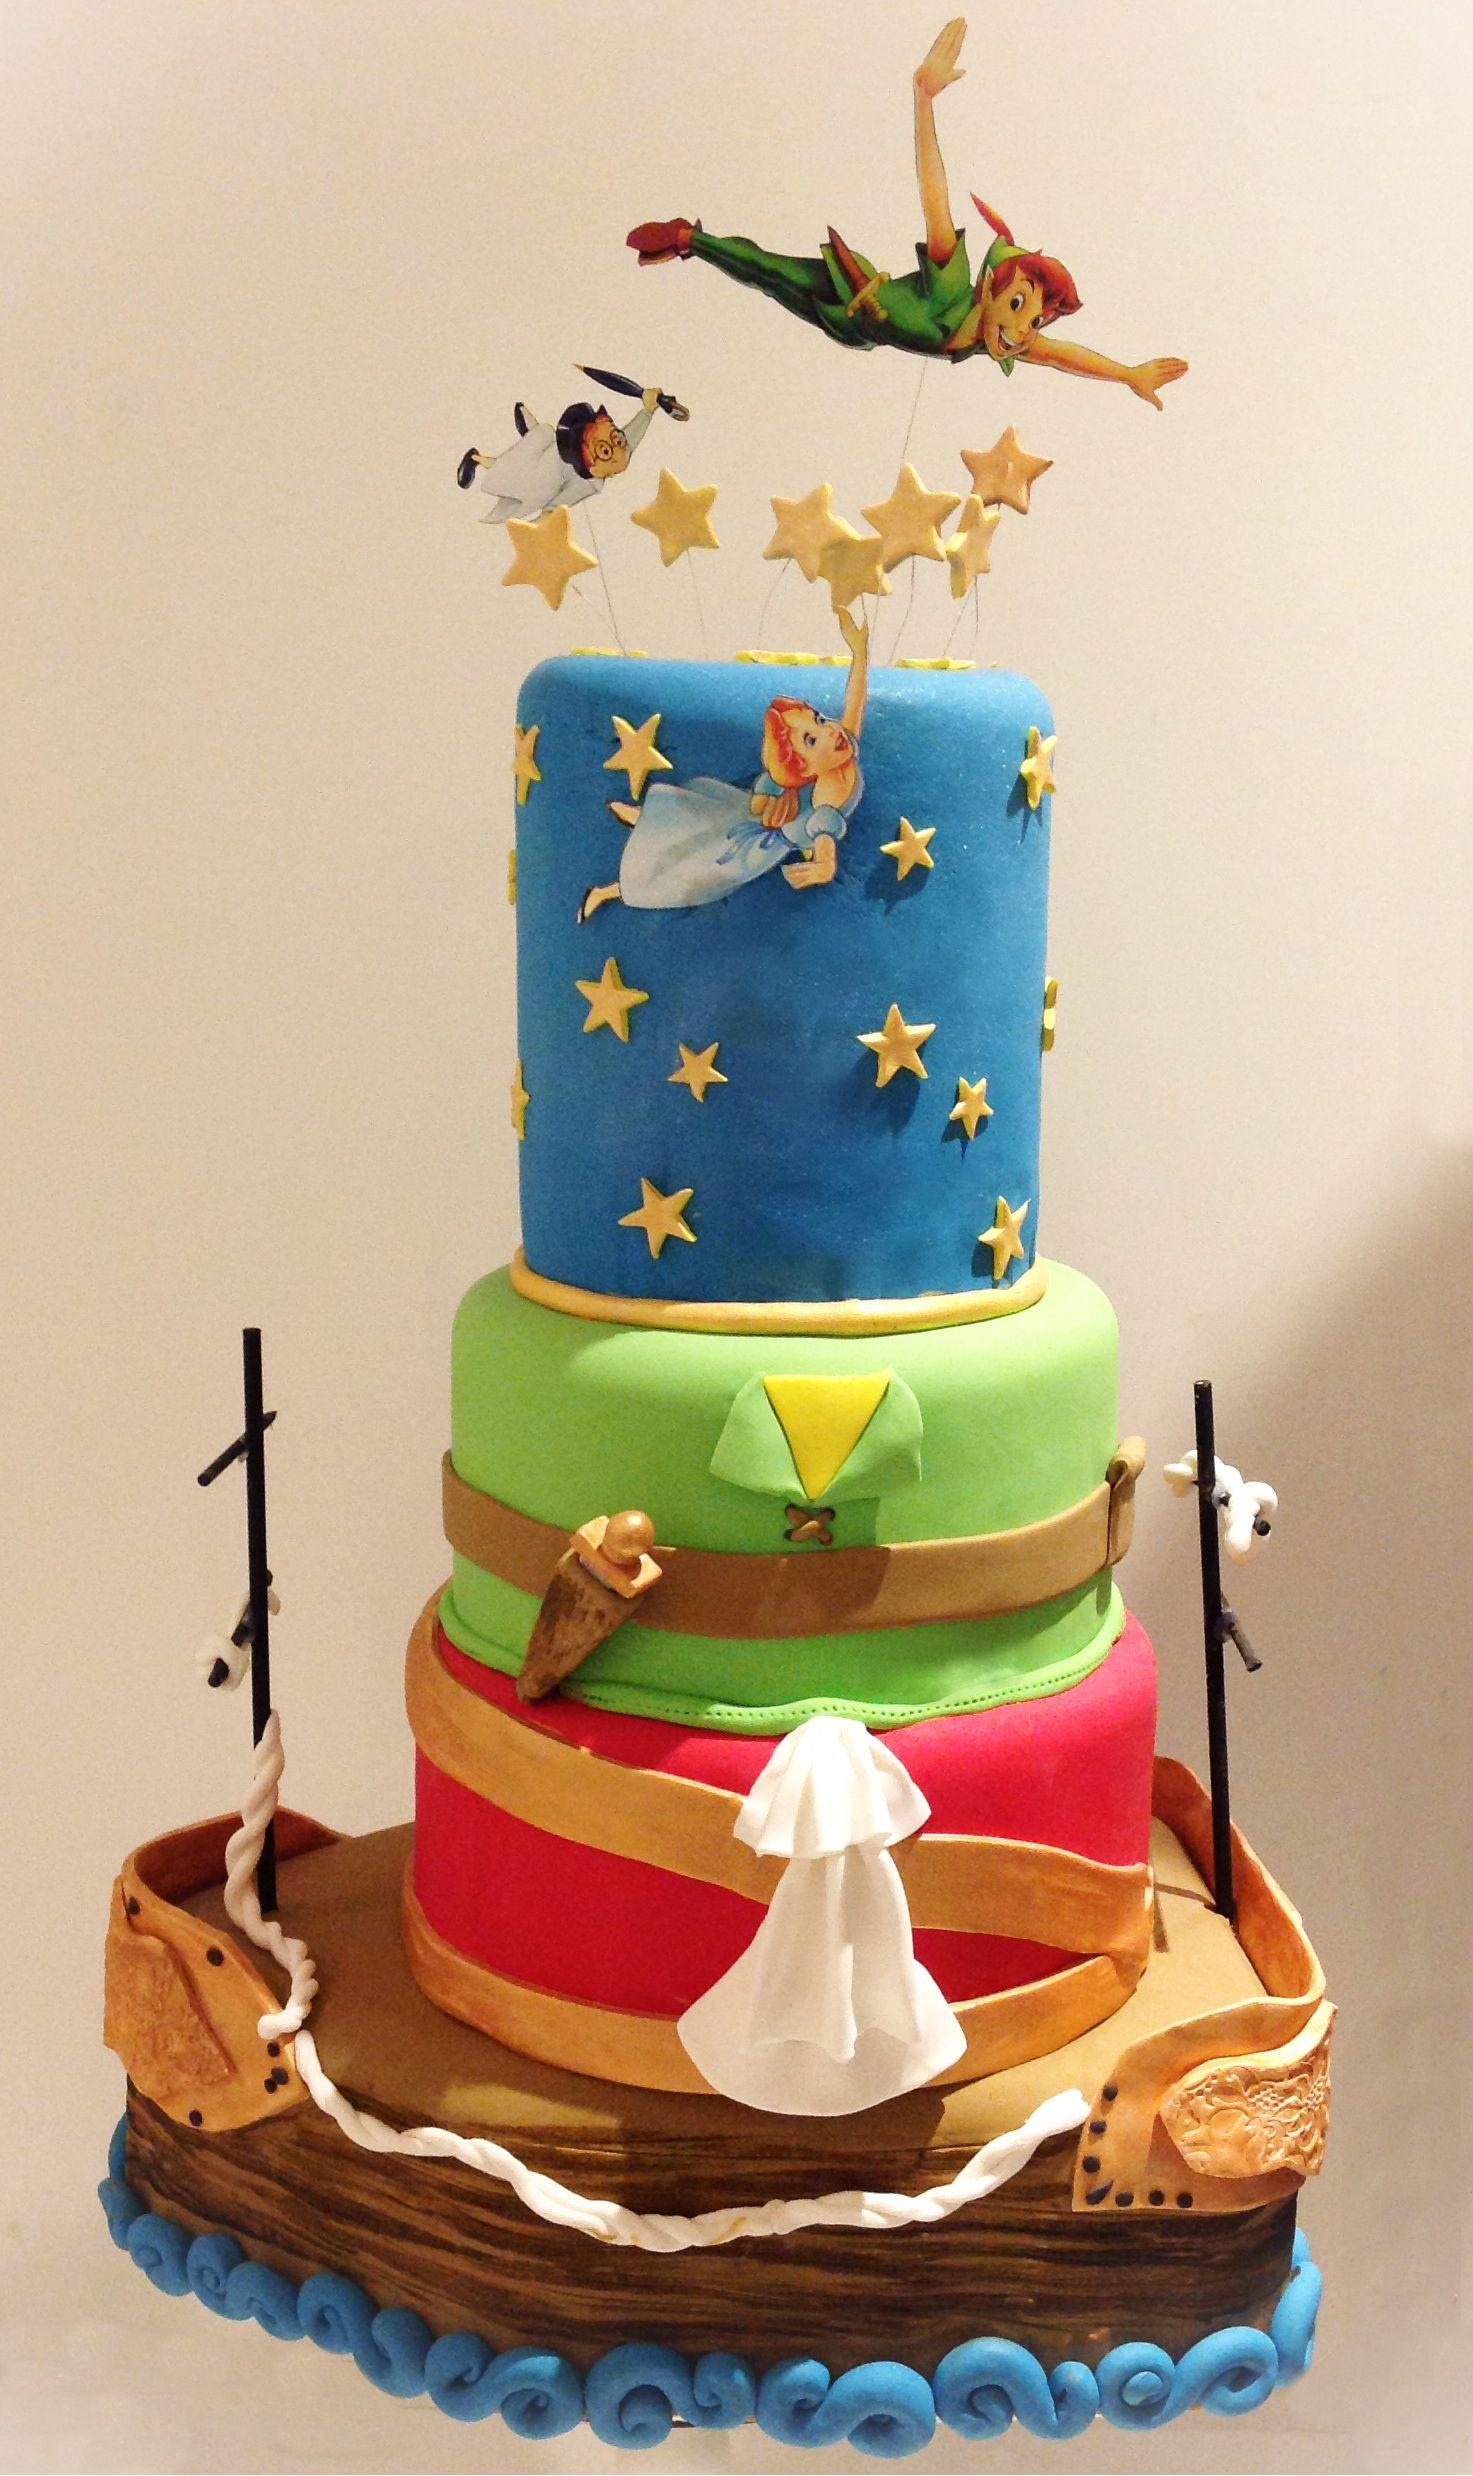 Swell Peter Pan Birthday Cake Peter Pan Cakes Peter Pan Disney Peter Personalised Birthday Cards Paralily Jamesorg